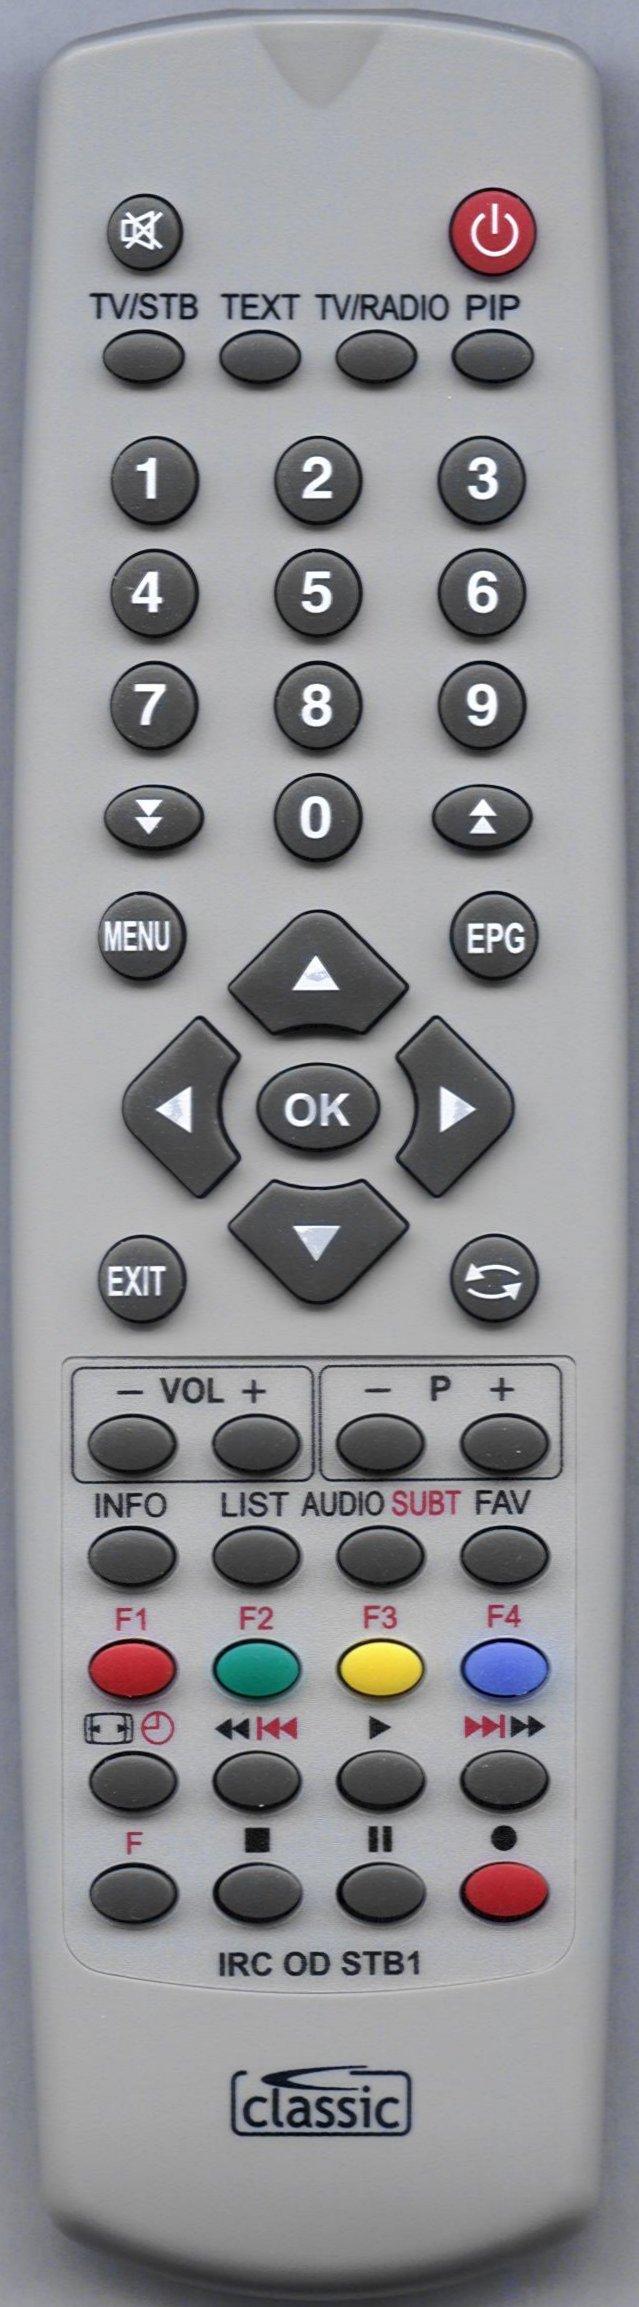 TECHNOMATE TM-5300D+ M2 USB SUPER PLUS Remote Control